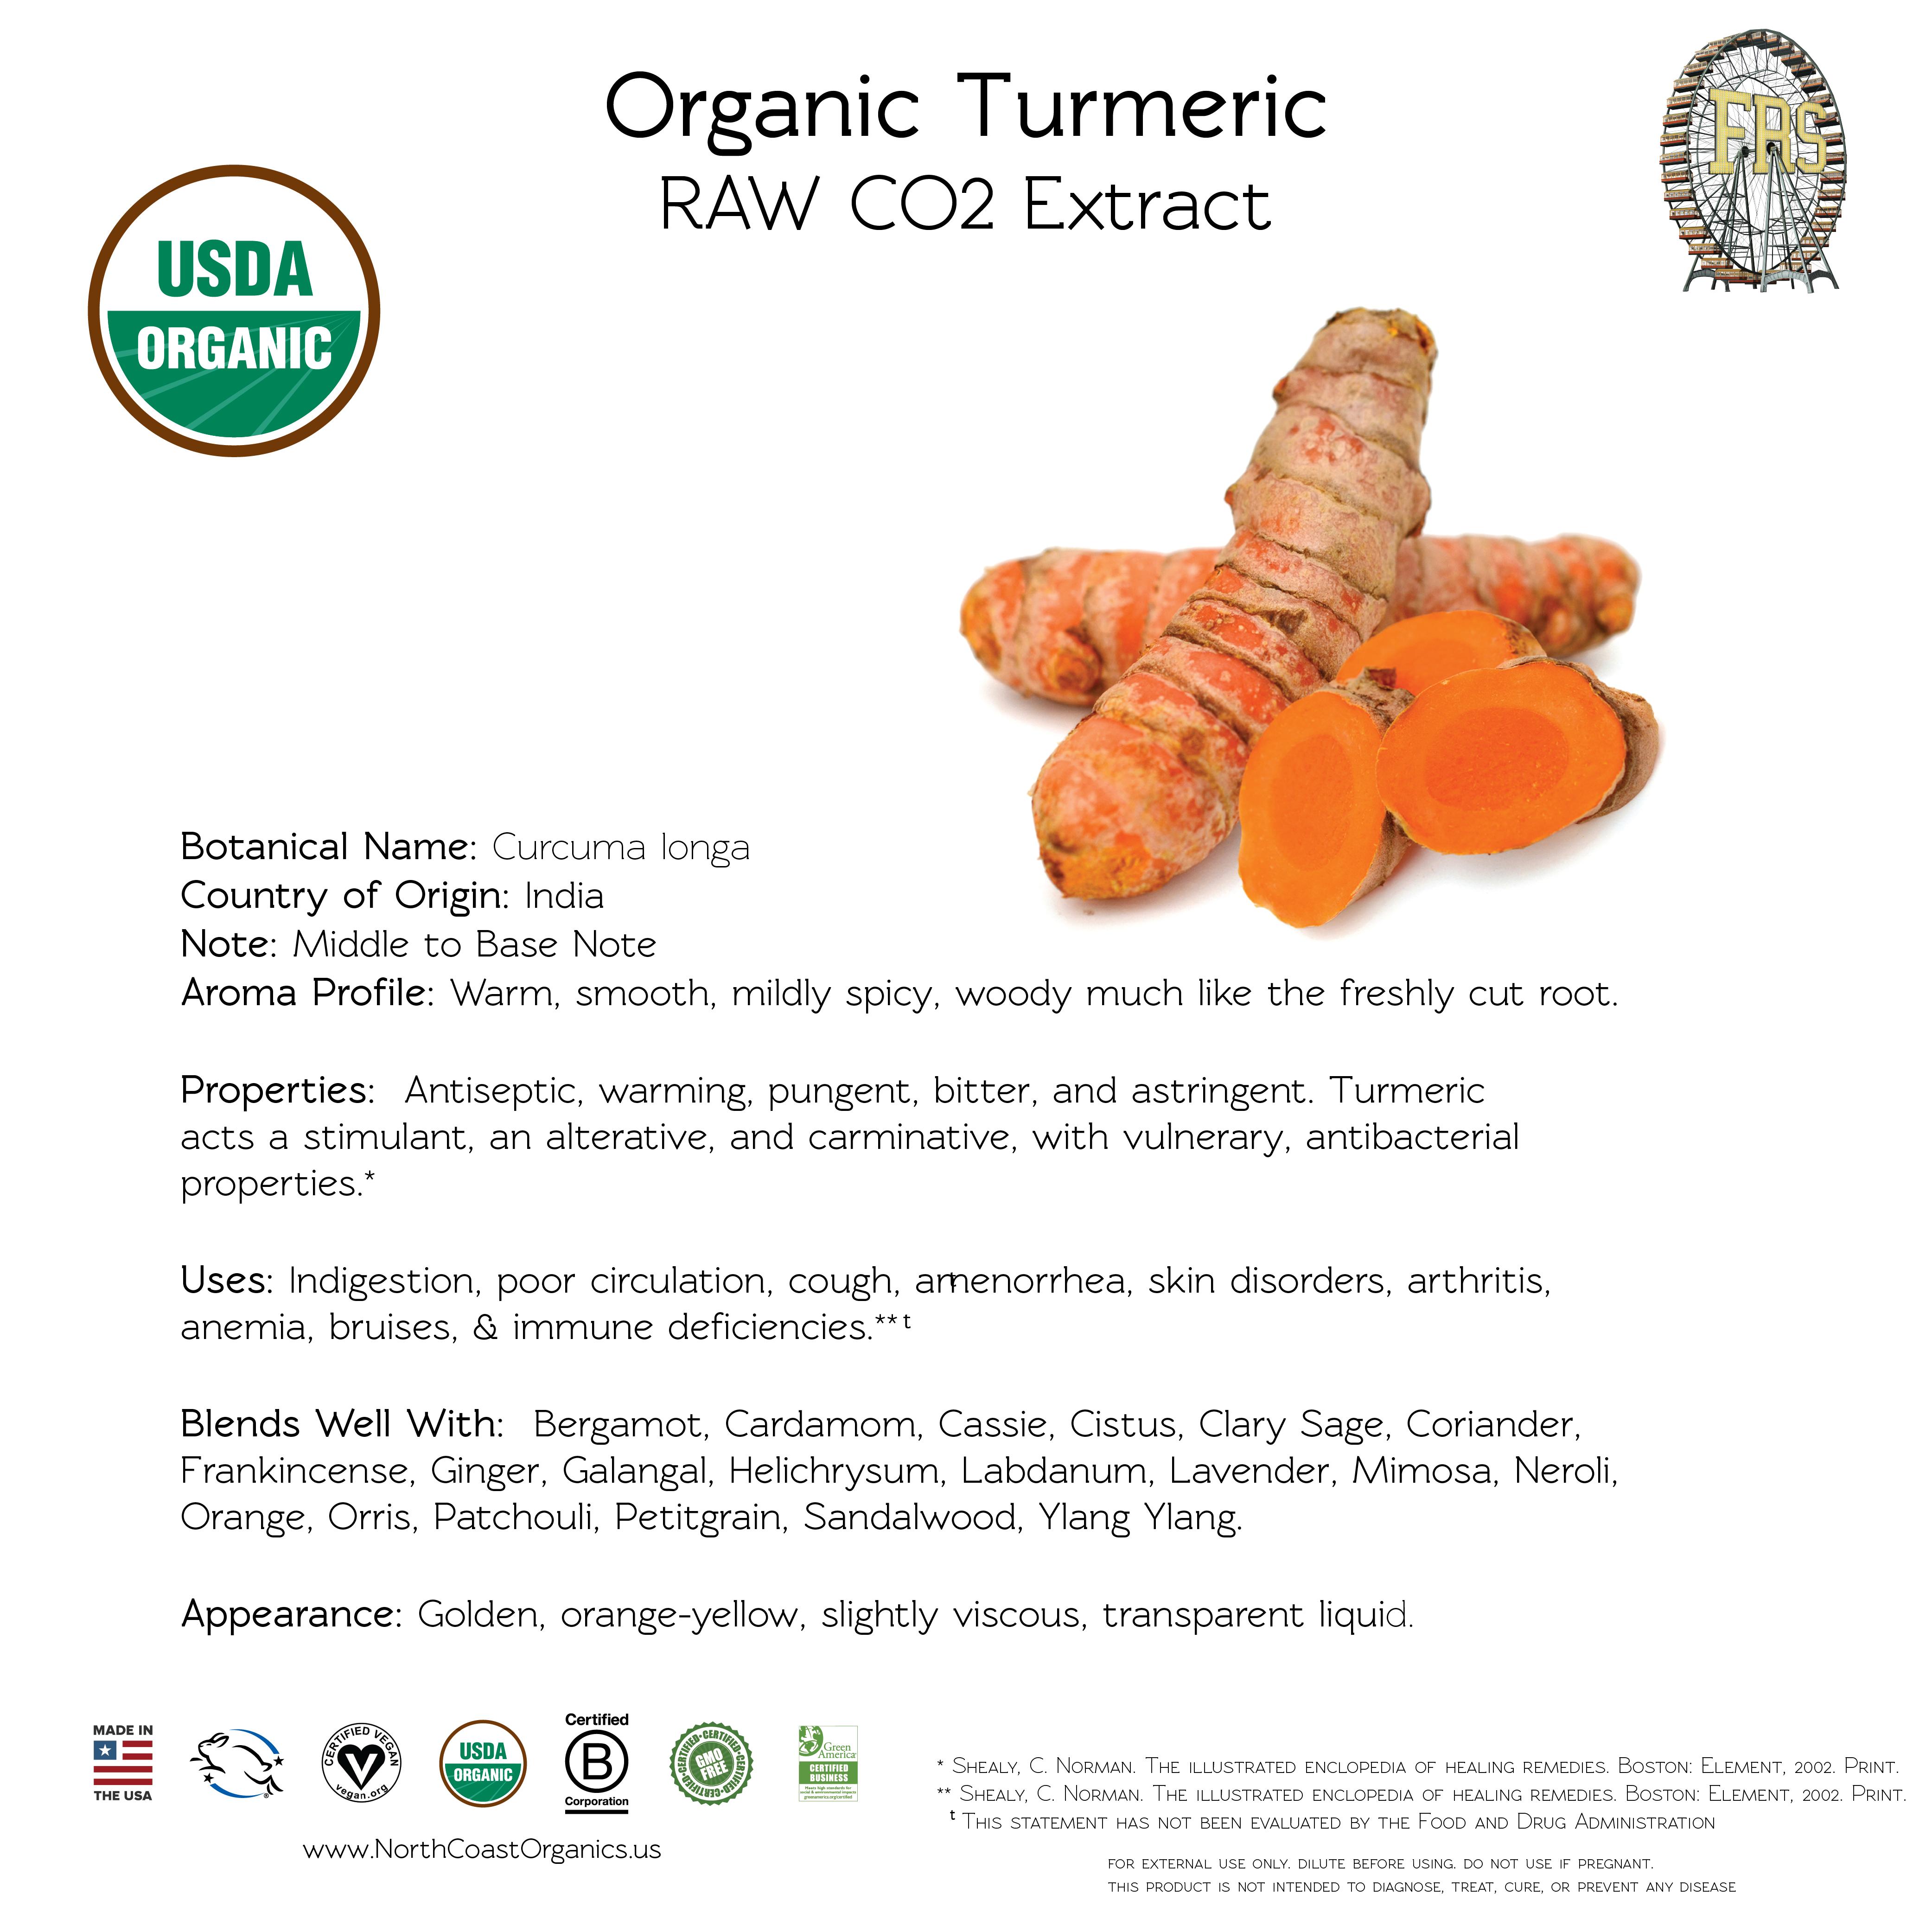 Organic Turmeric Essential Oil Information